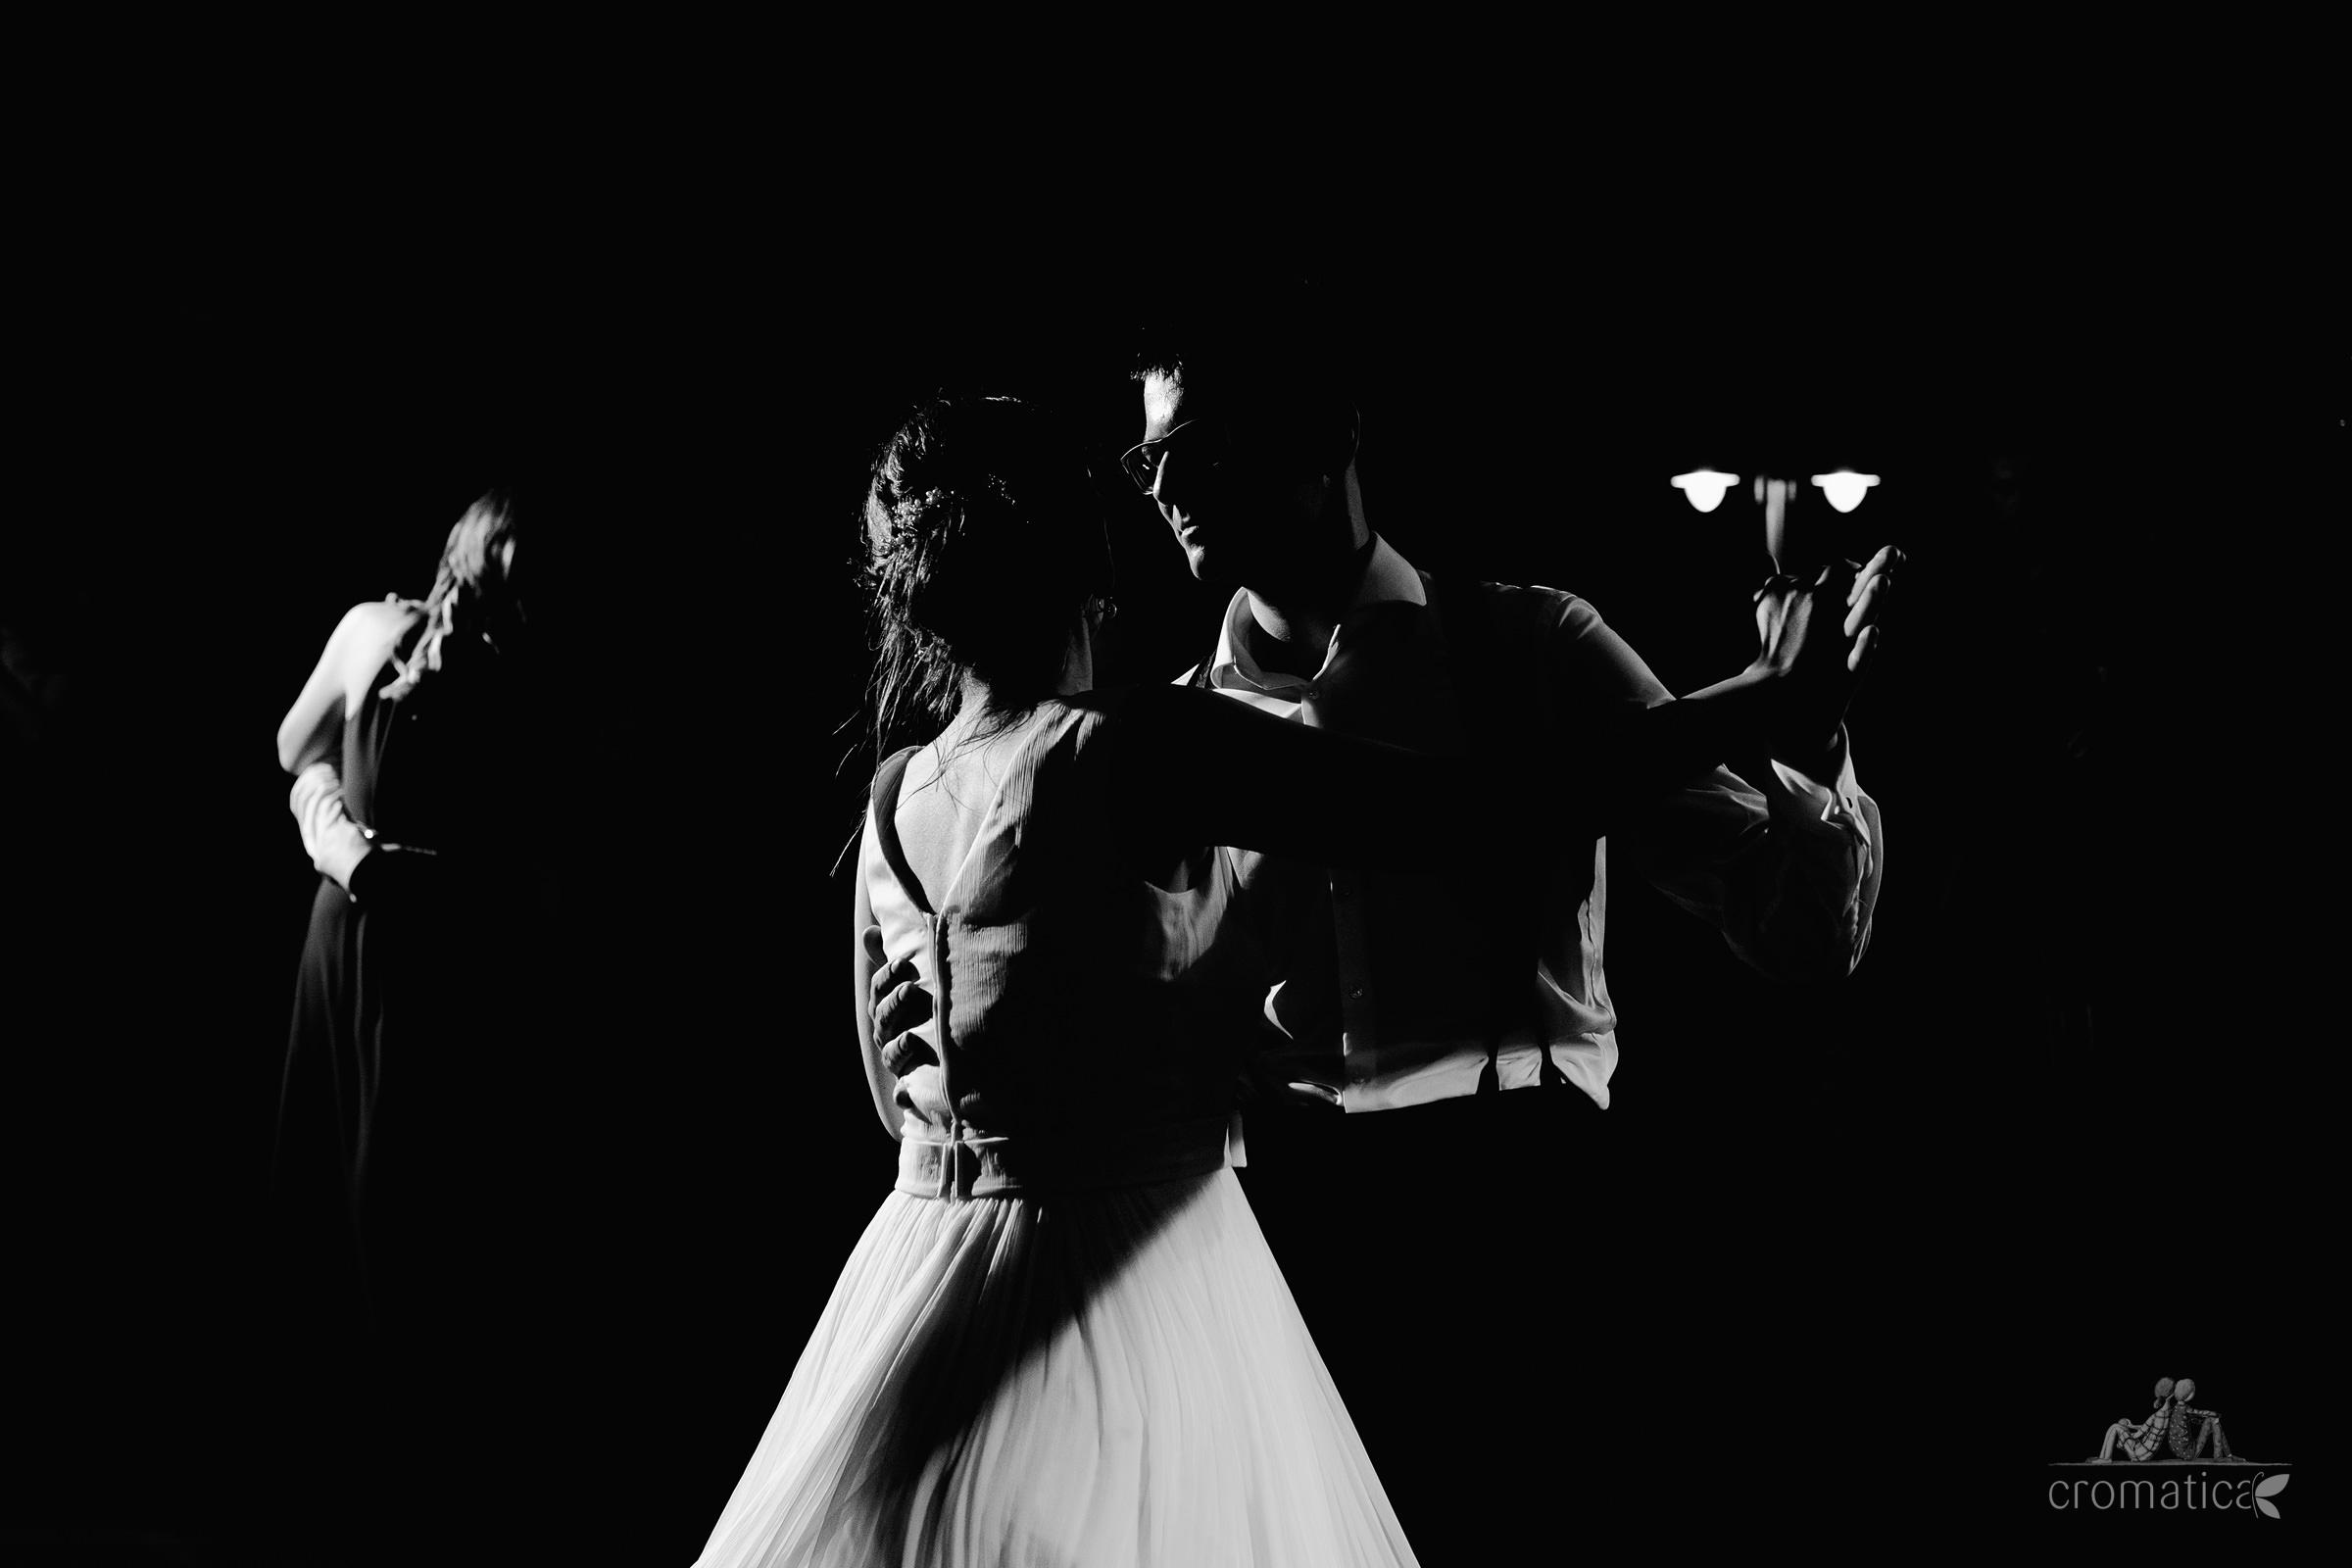 sinziana victor fotografii nunta snagov club 098